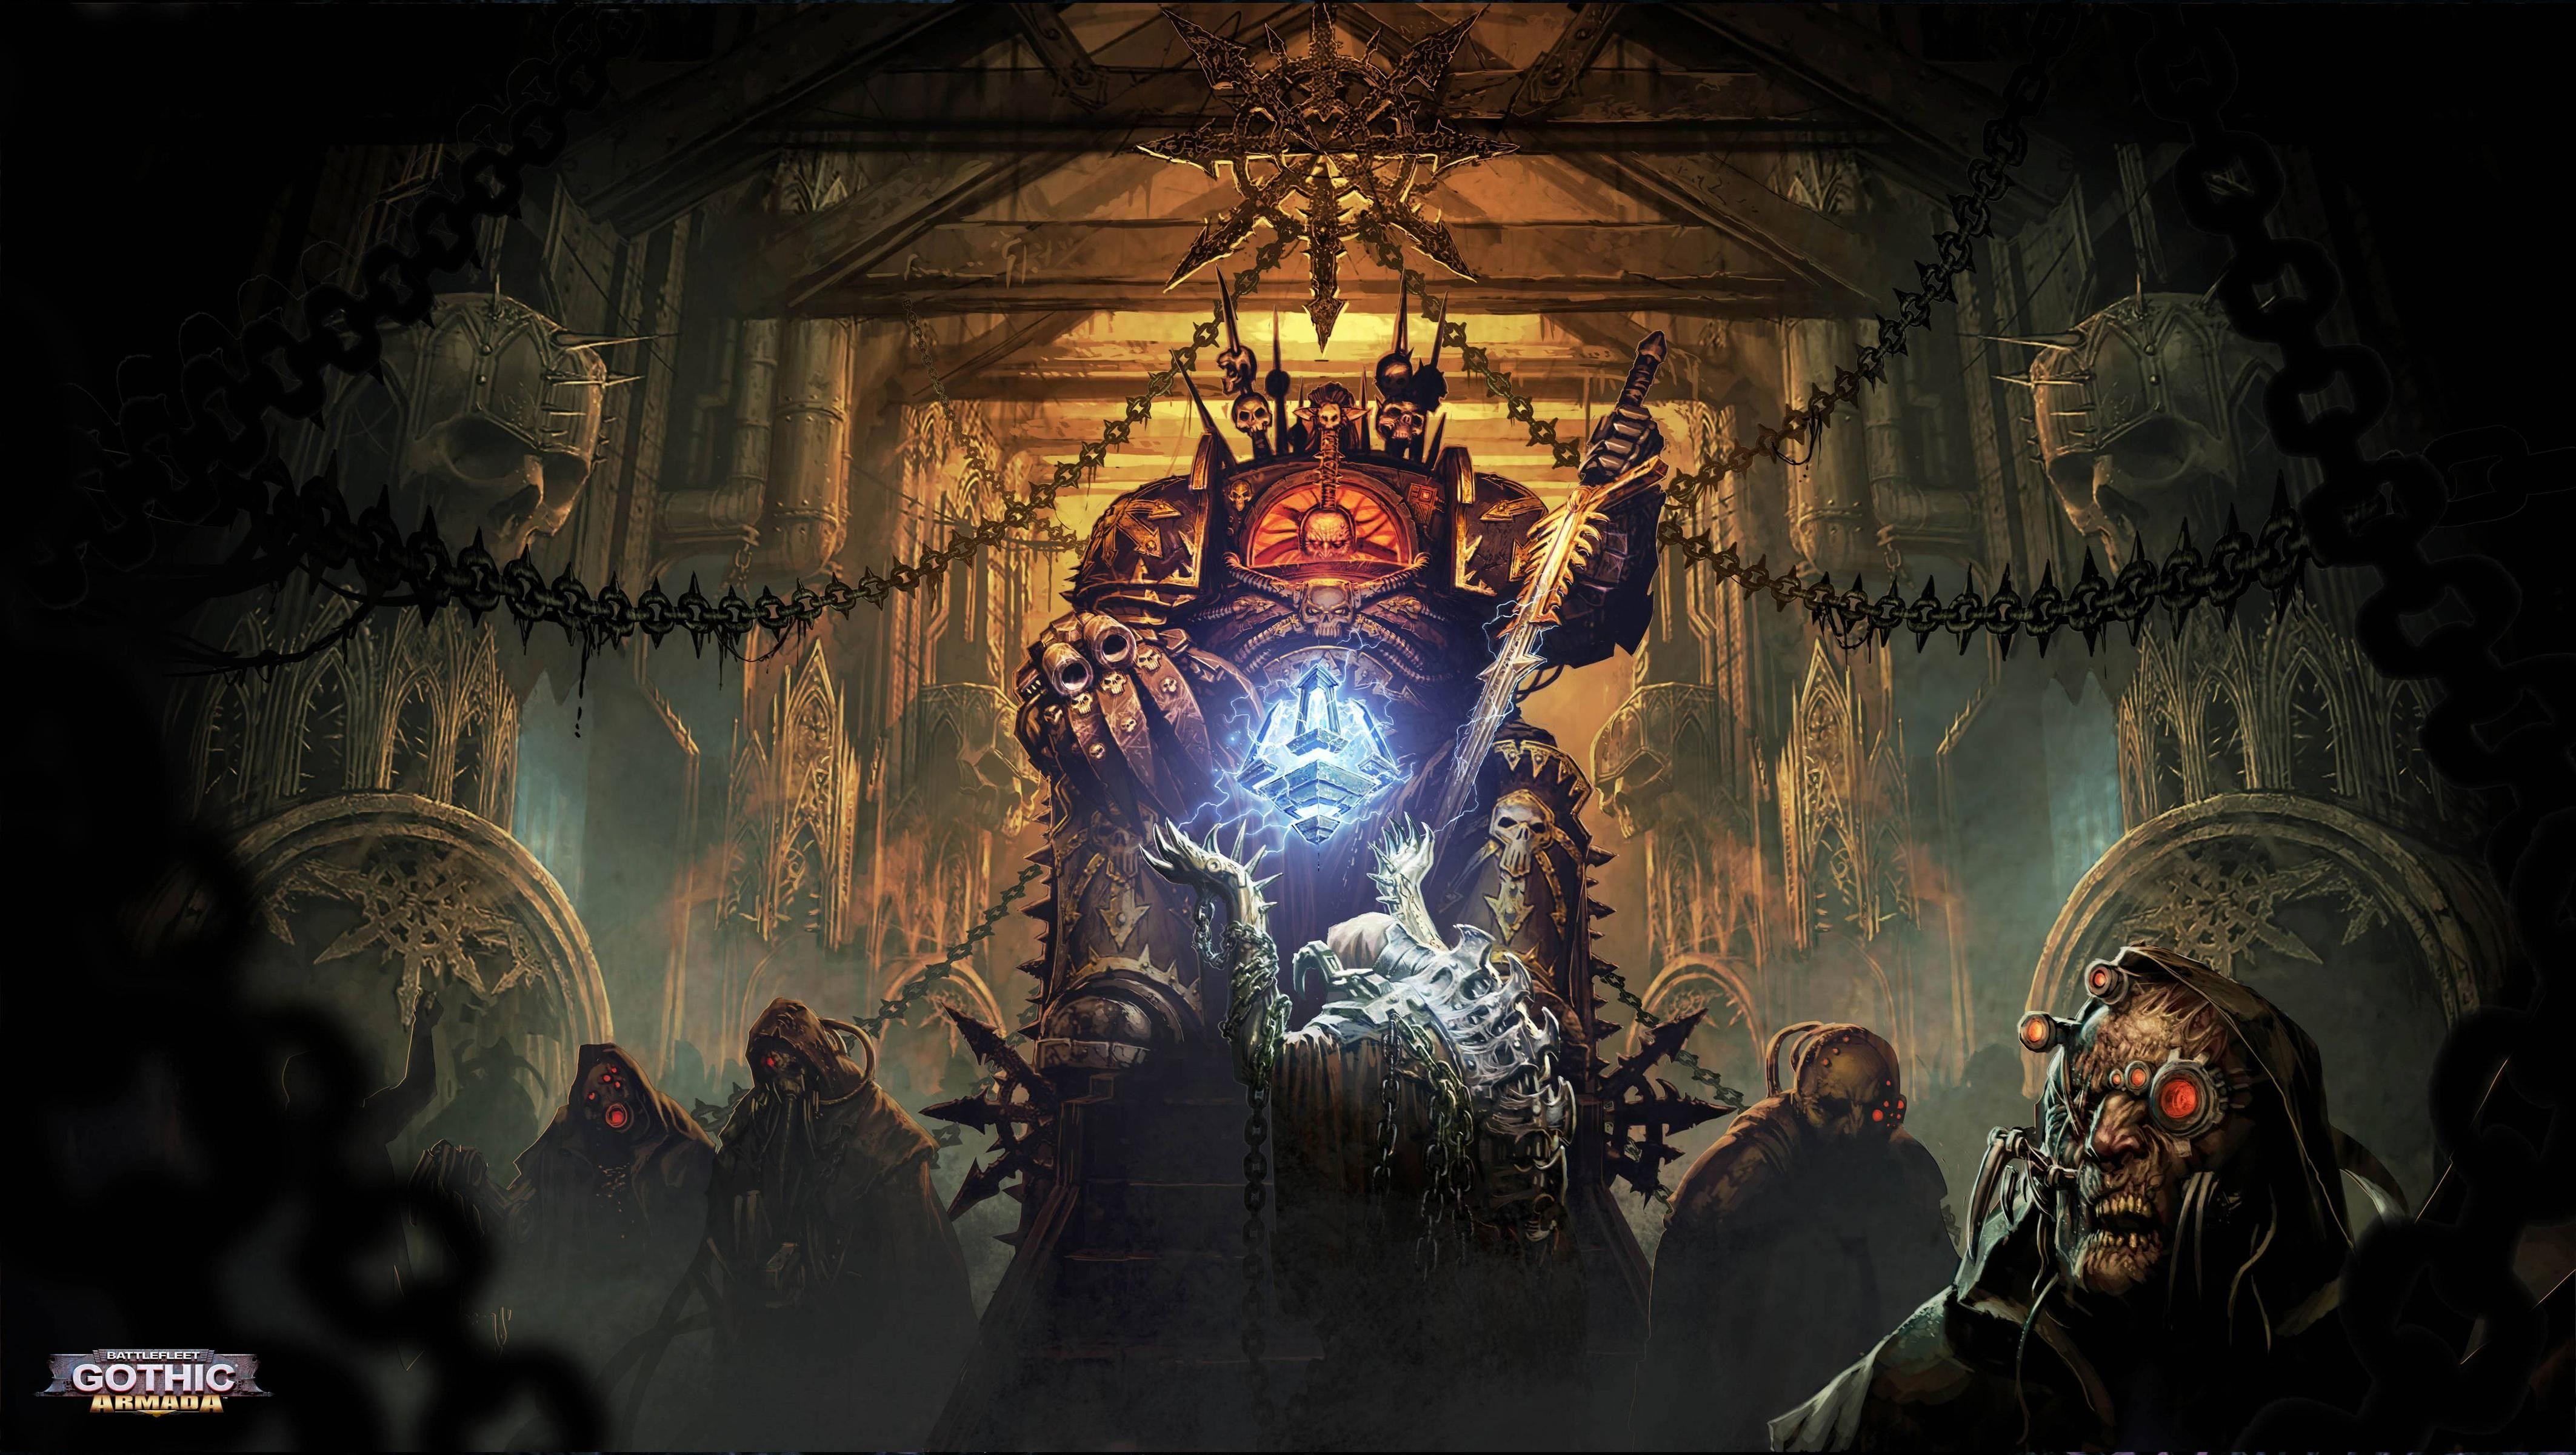 4250x2400px battlefleet gothic armada wallpapers 1080p high 4250x2400